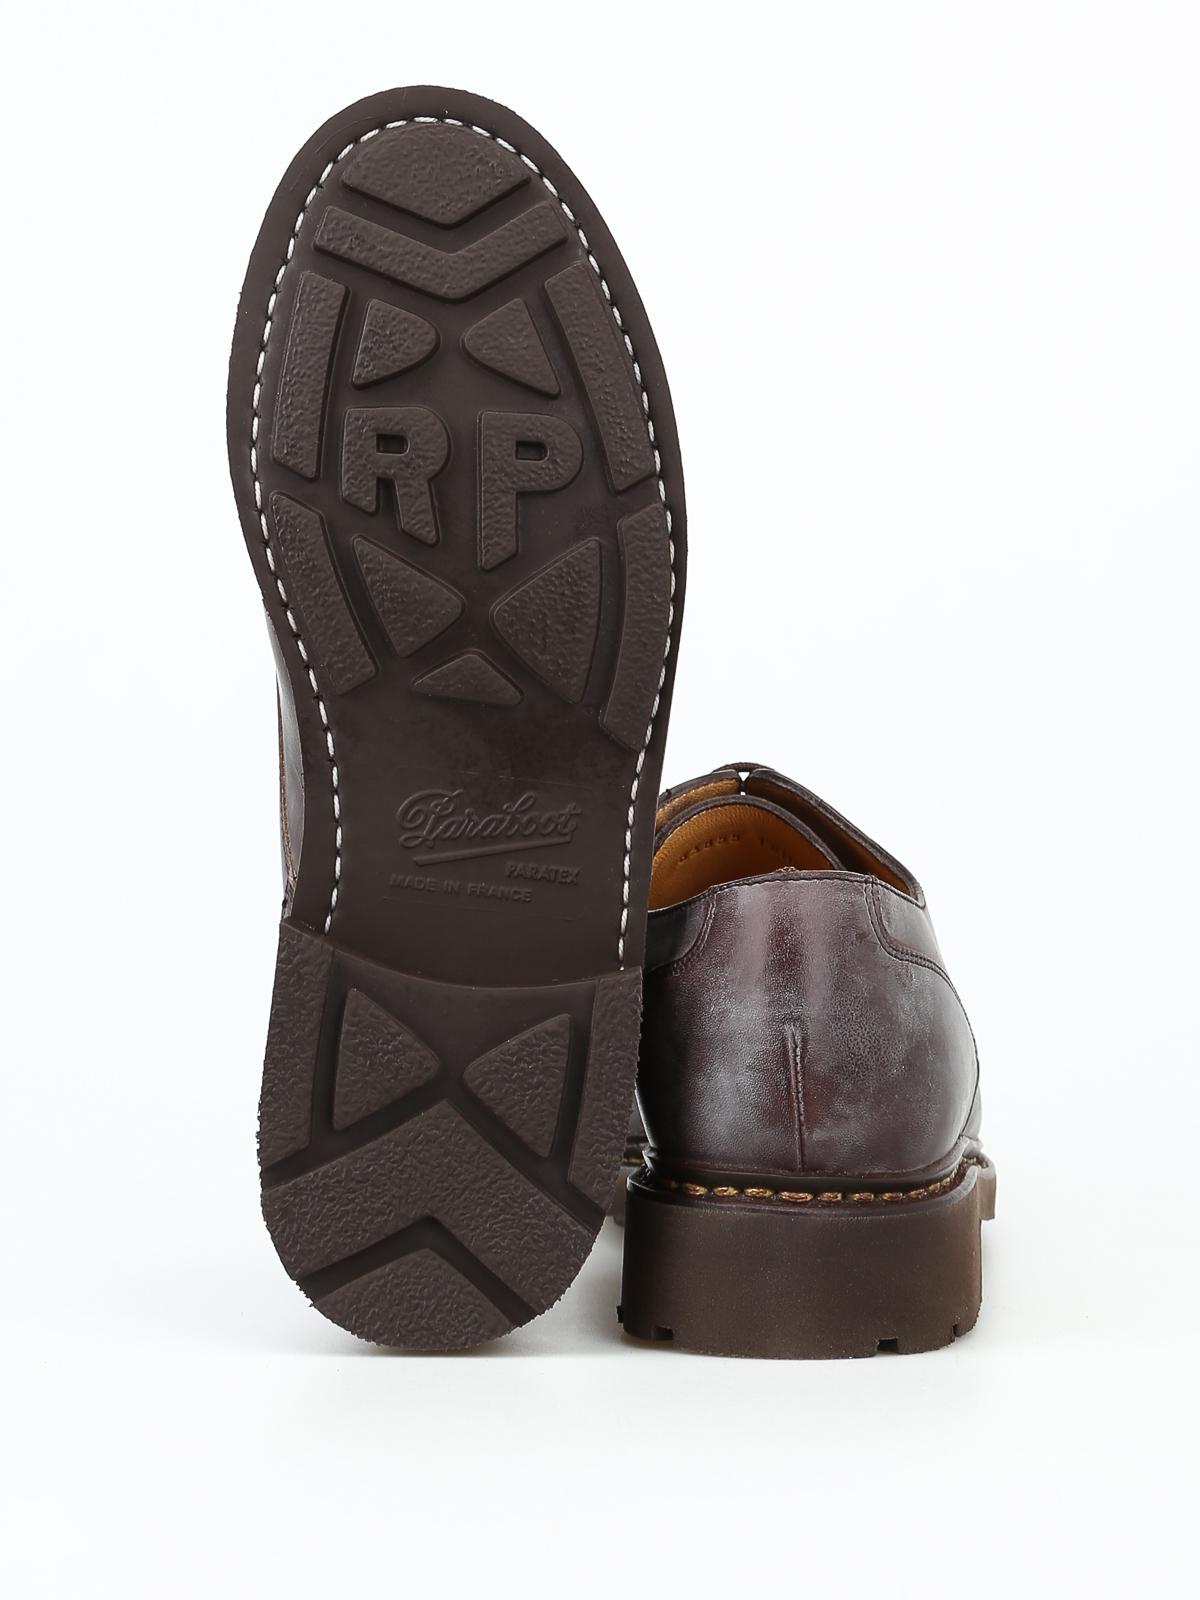 sports shoes cf21a b27f4 Paraboot - Allacciate Chambord in pelle vintage - scarpe ...